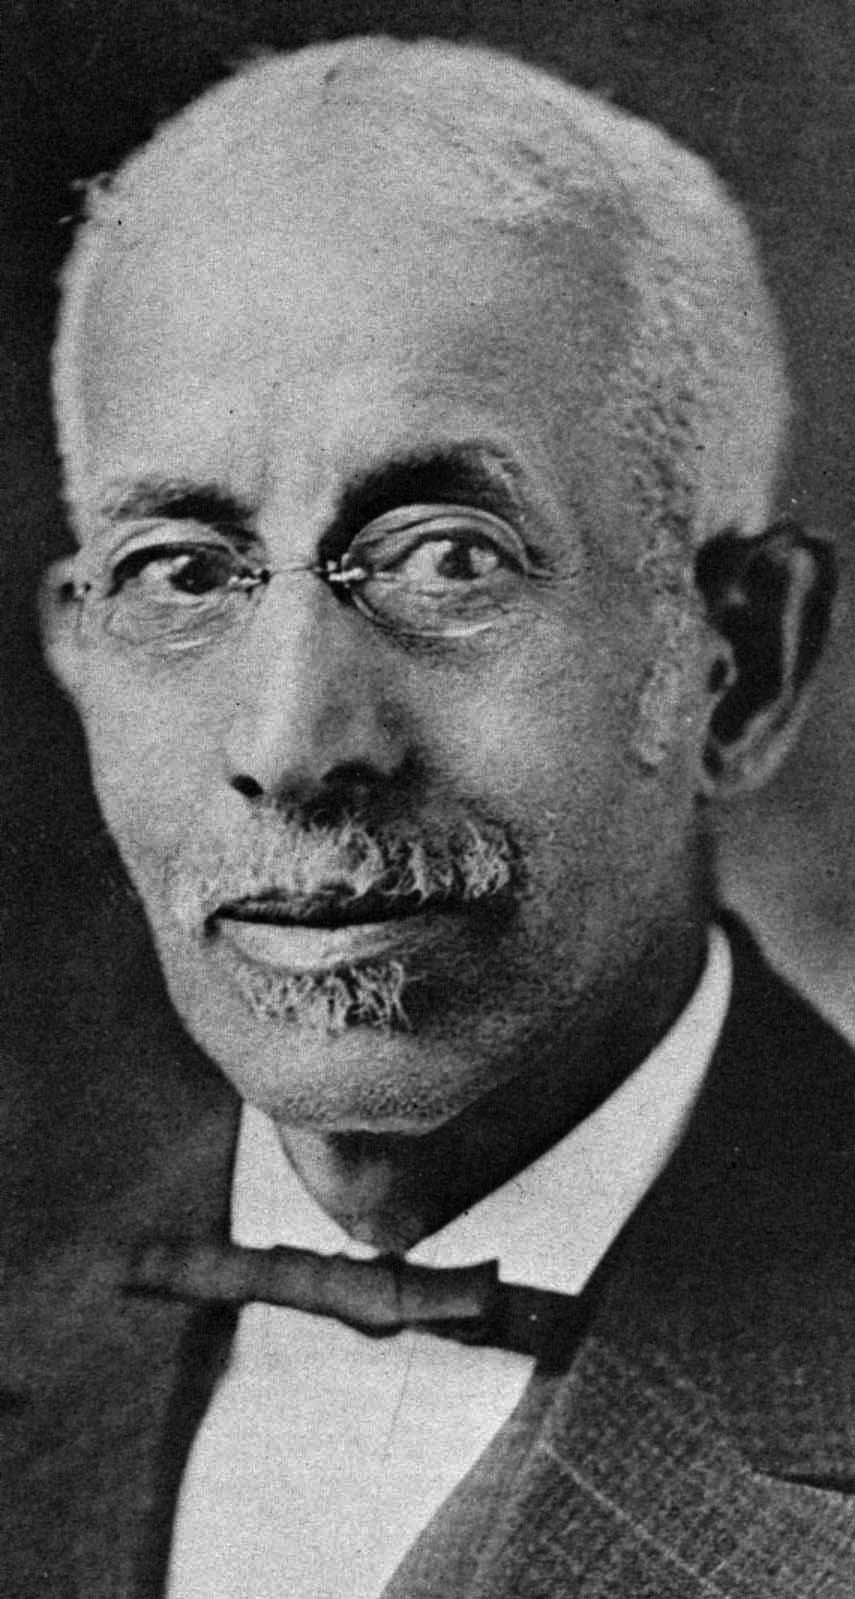 John H. Murphy Sr., Ebony Pictorial History of Black America, Vol. 2 (Southwestern Co./ Johnson Publishing, 1971), p. 97